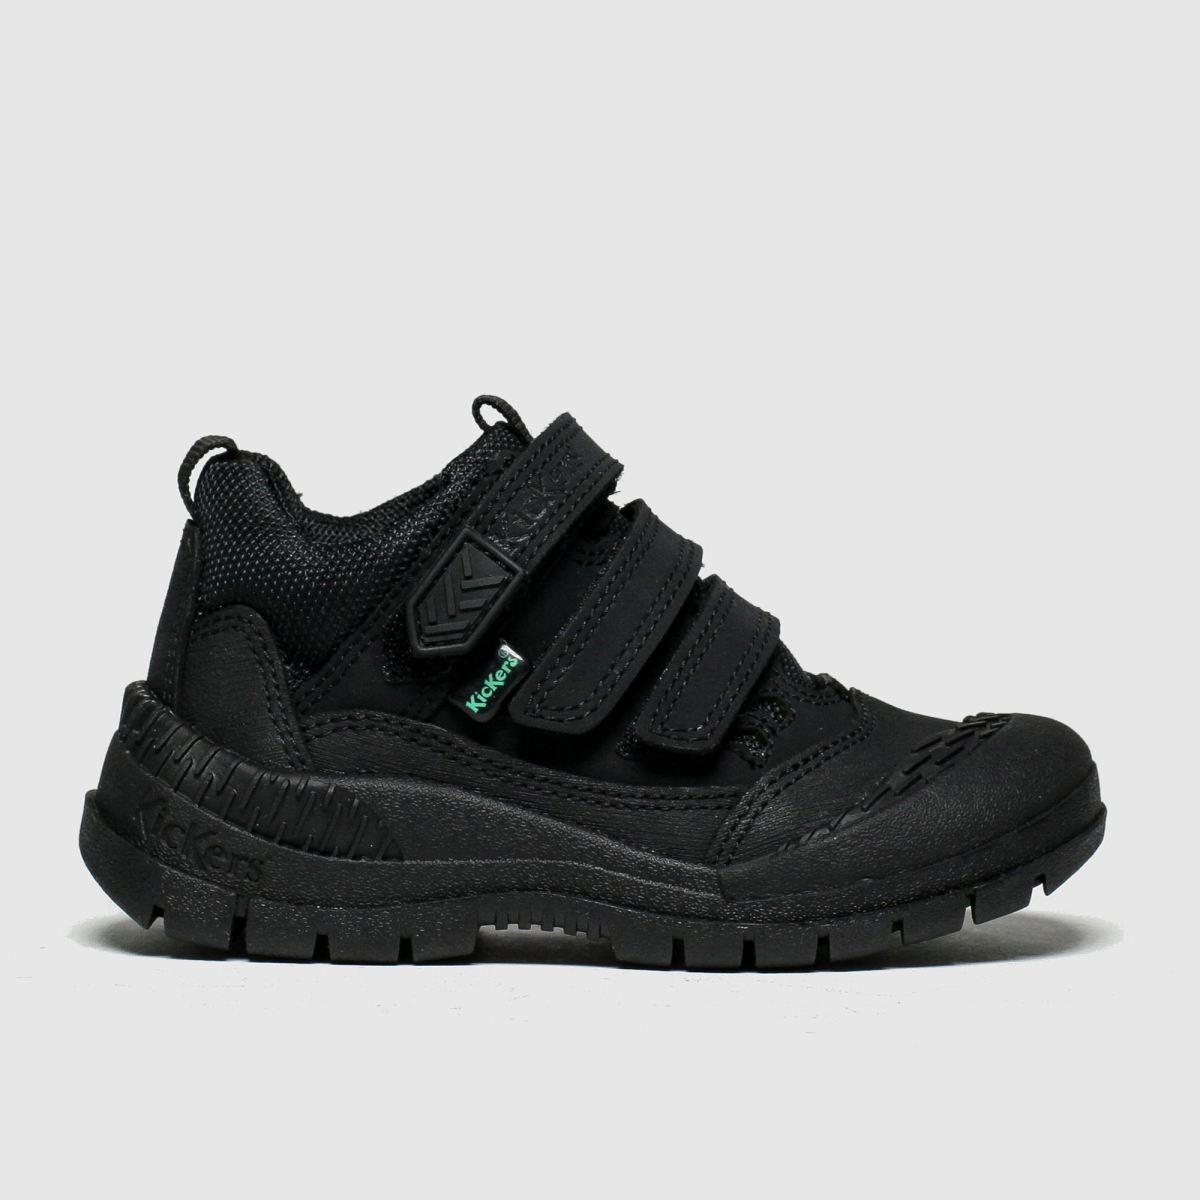 Kickers Black Kick Trukka Mid Shoes Toddler